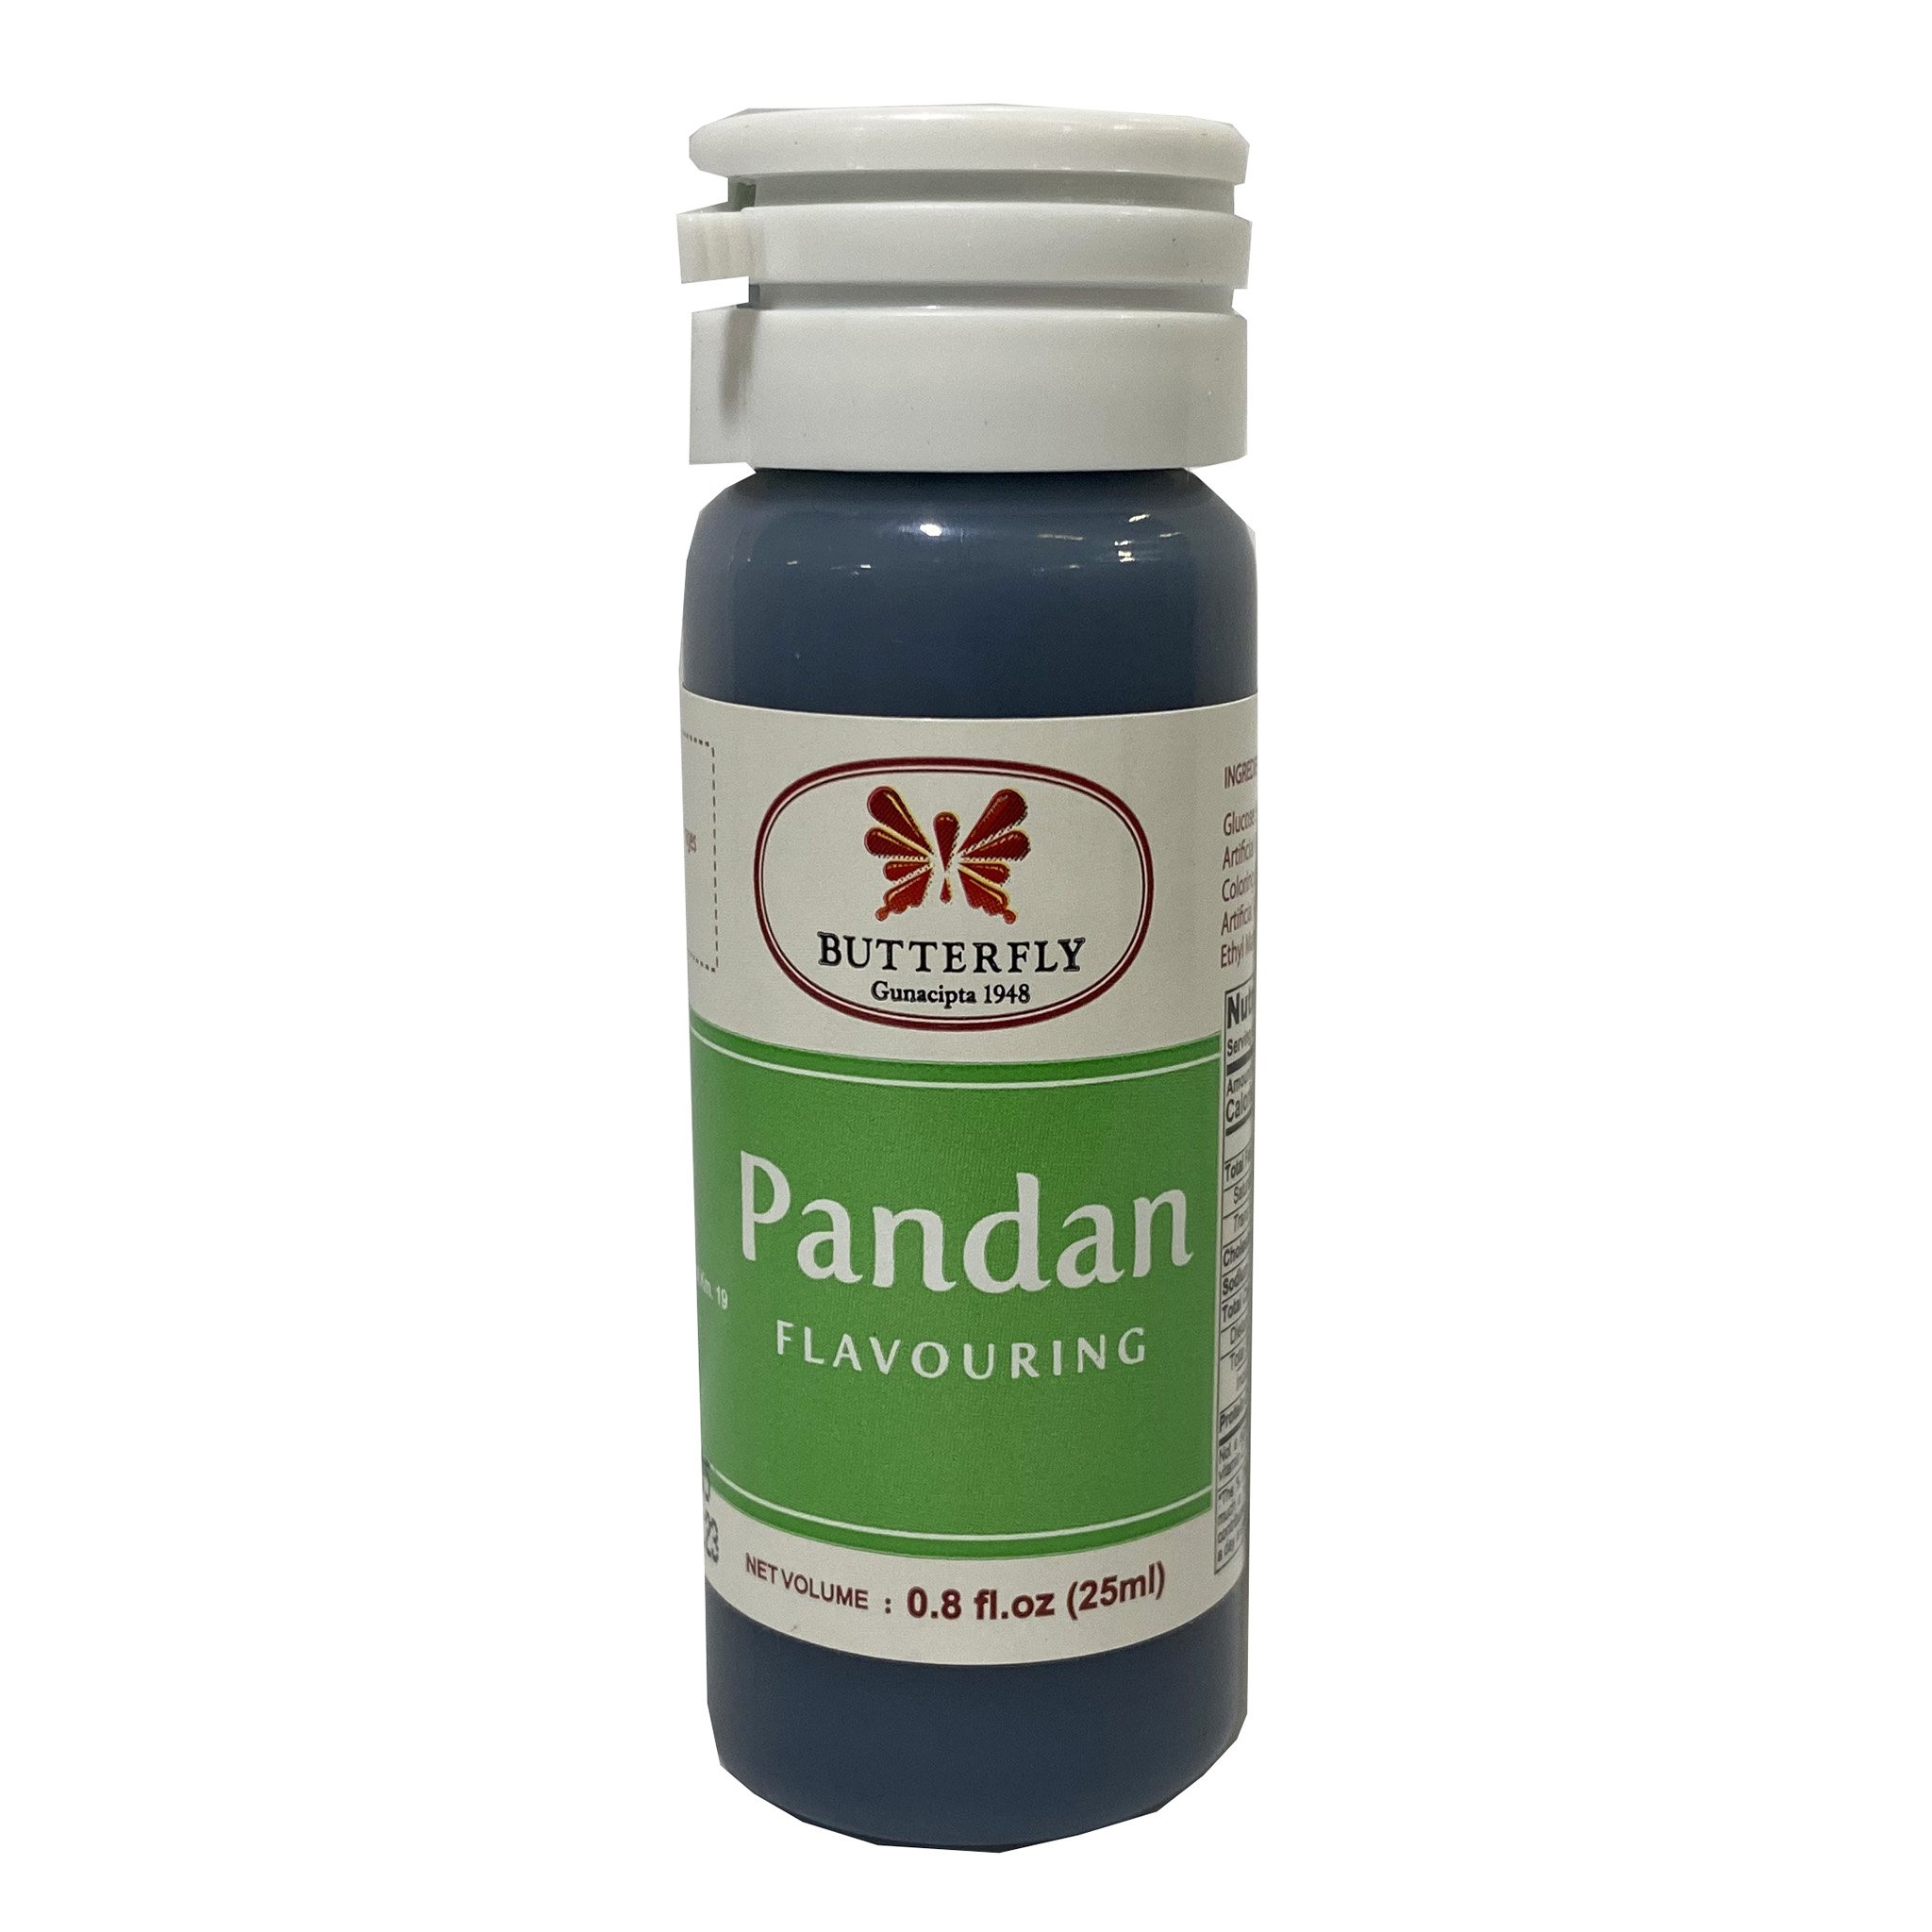 BUTTERFLY Pandan Flavouring 0.8 Fl Oz